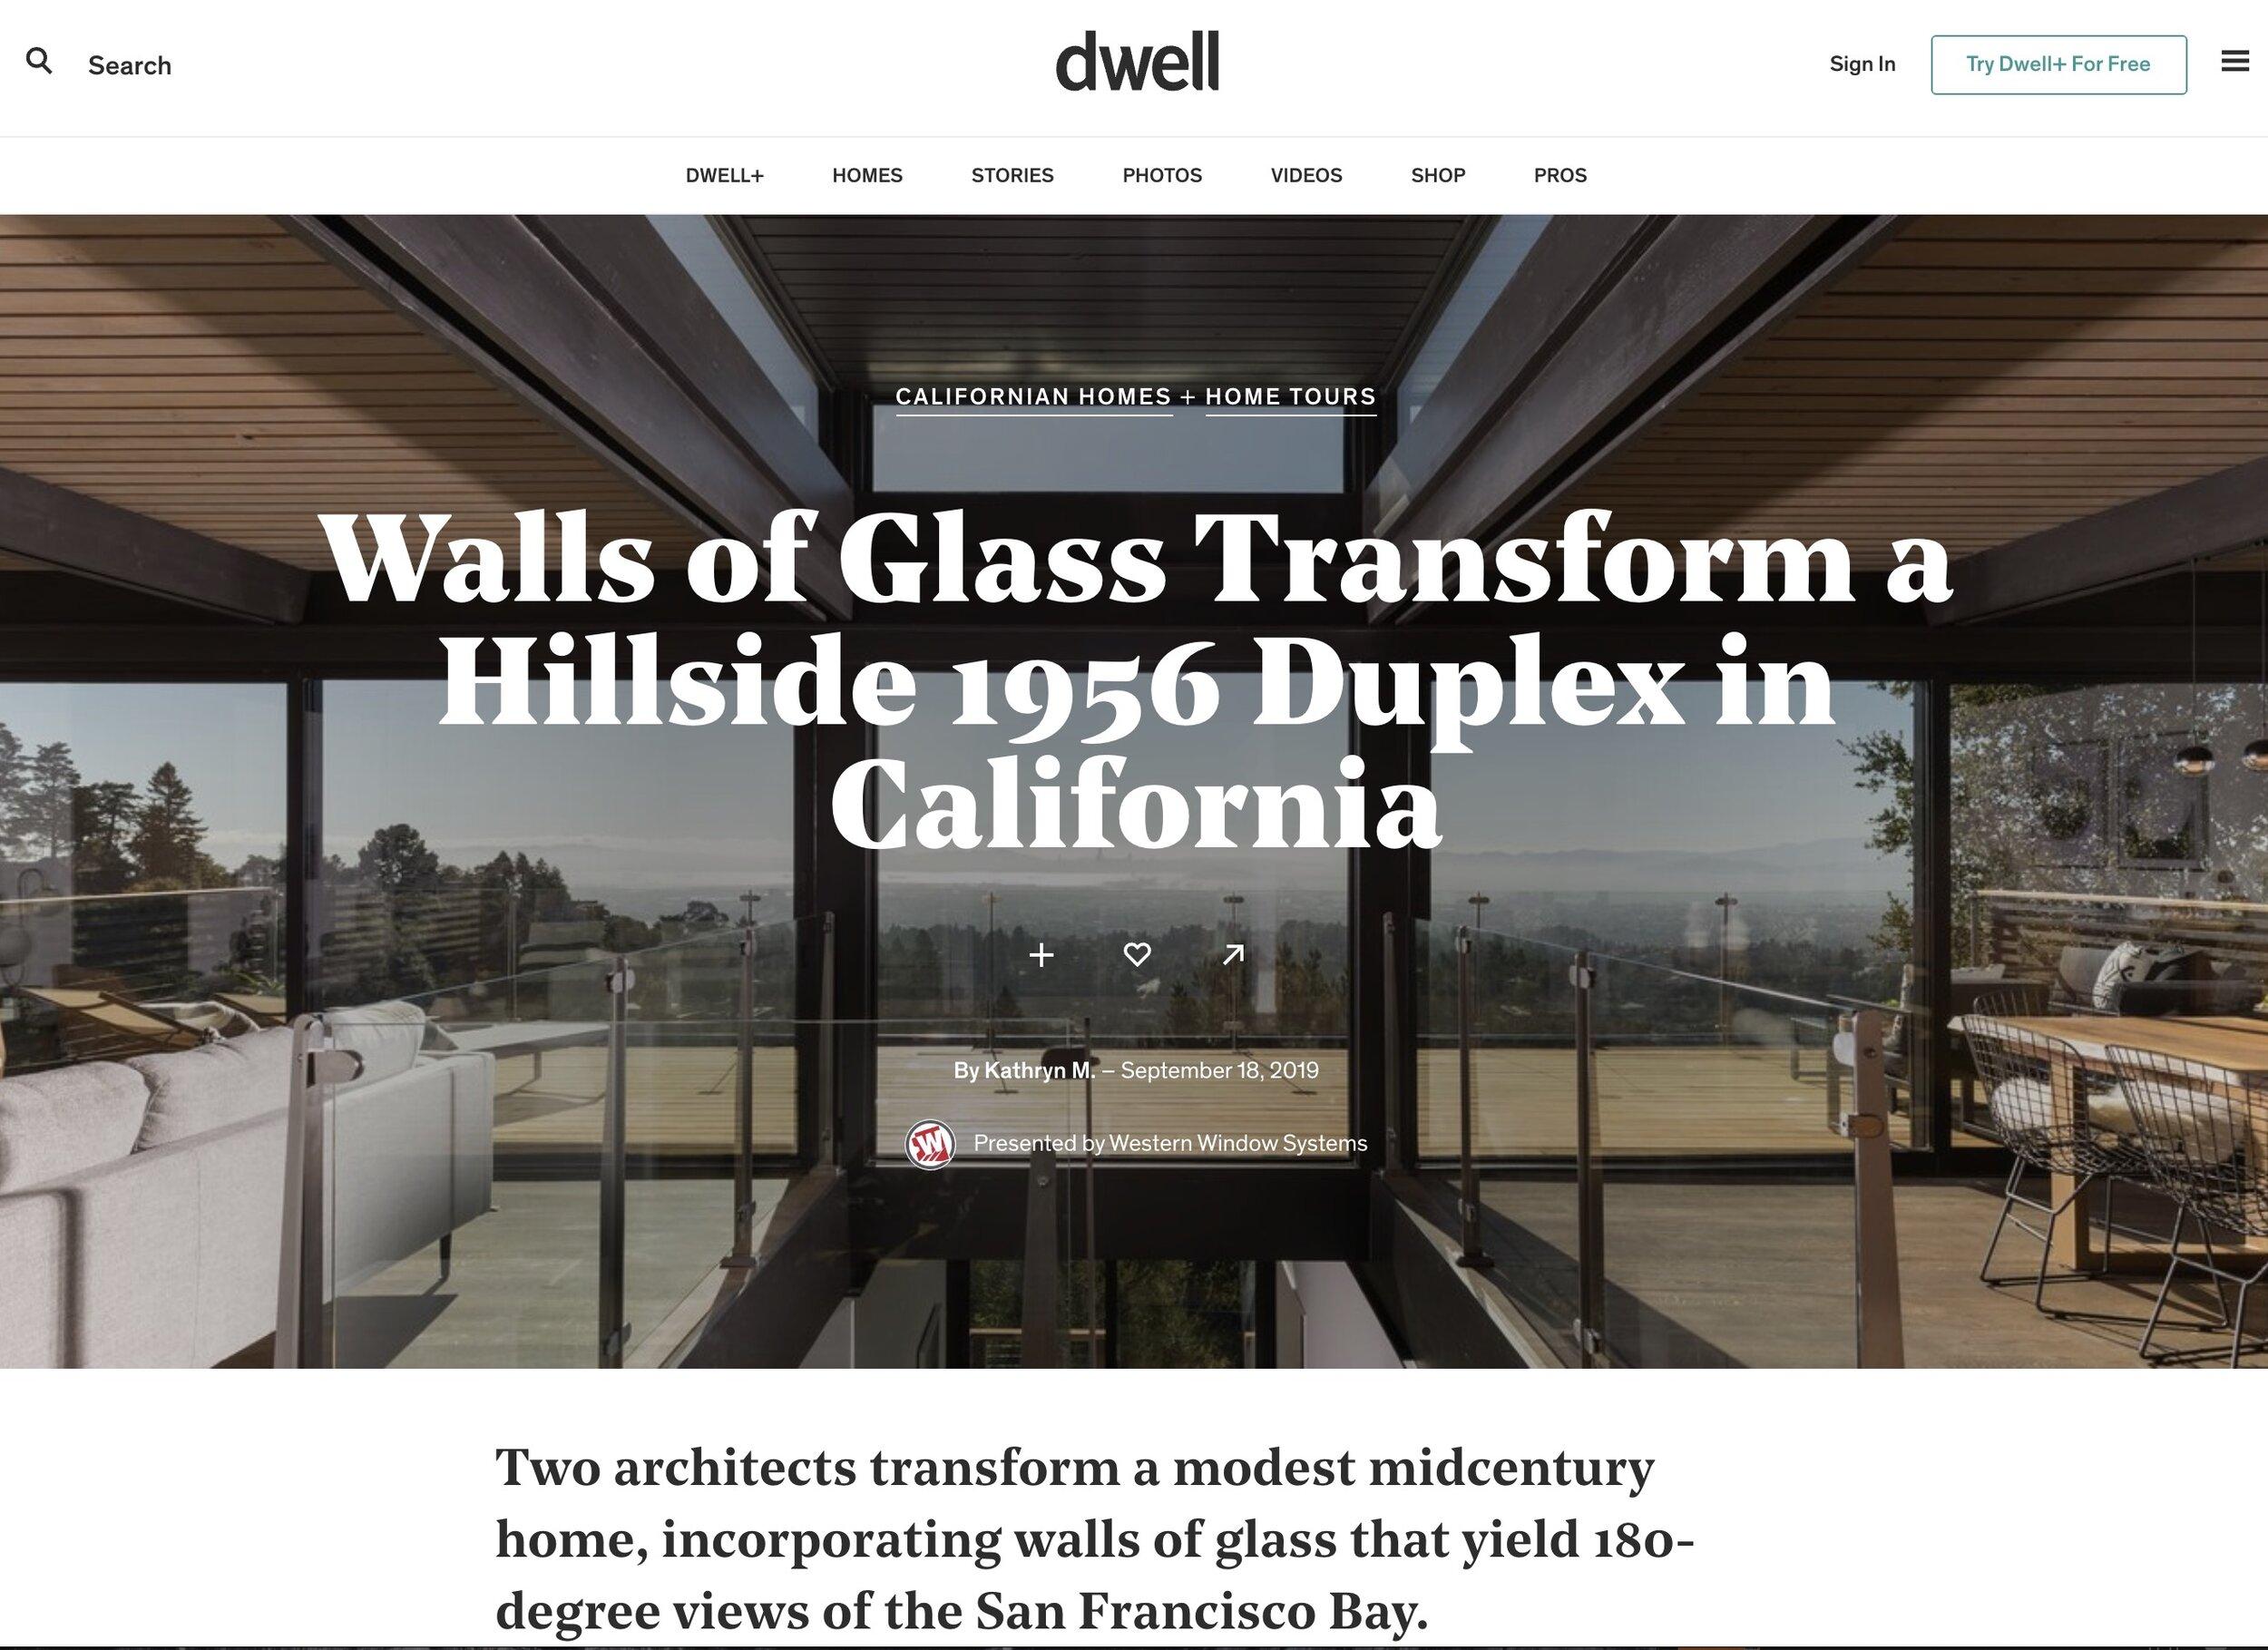 2019_Dwell.com